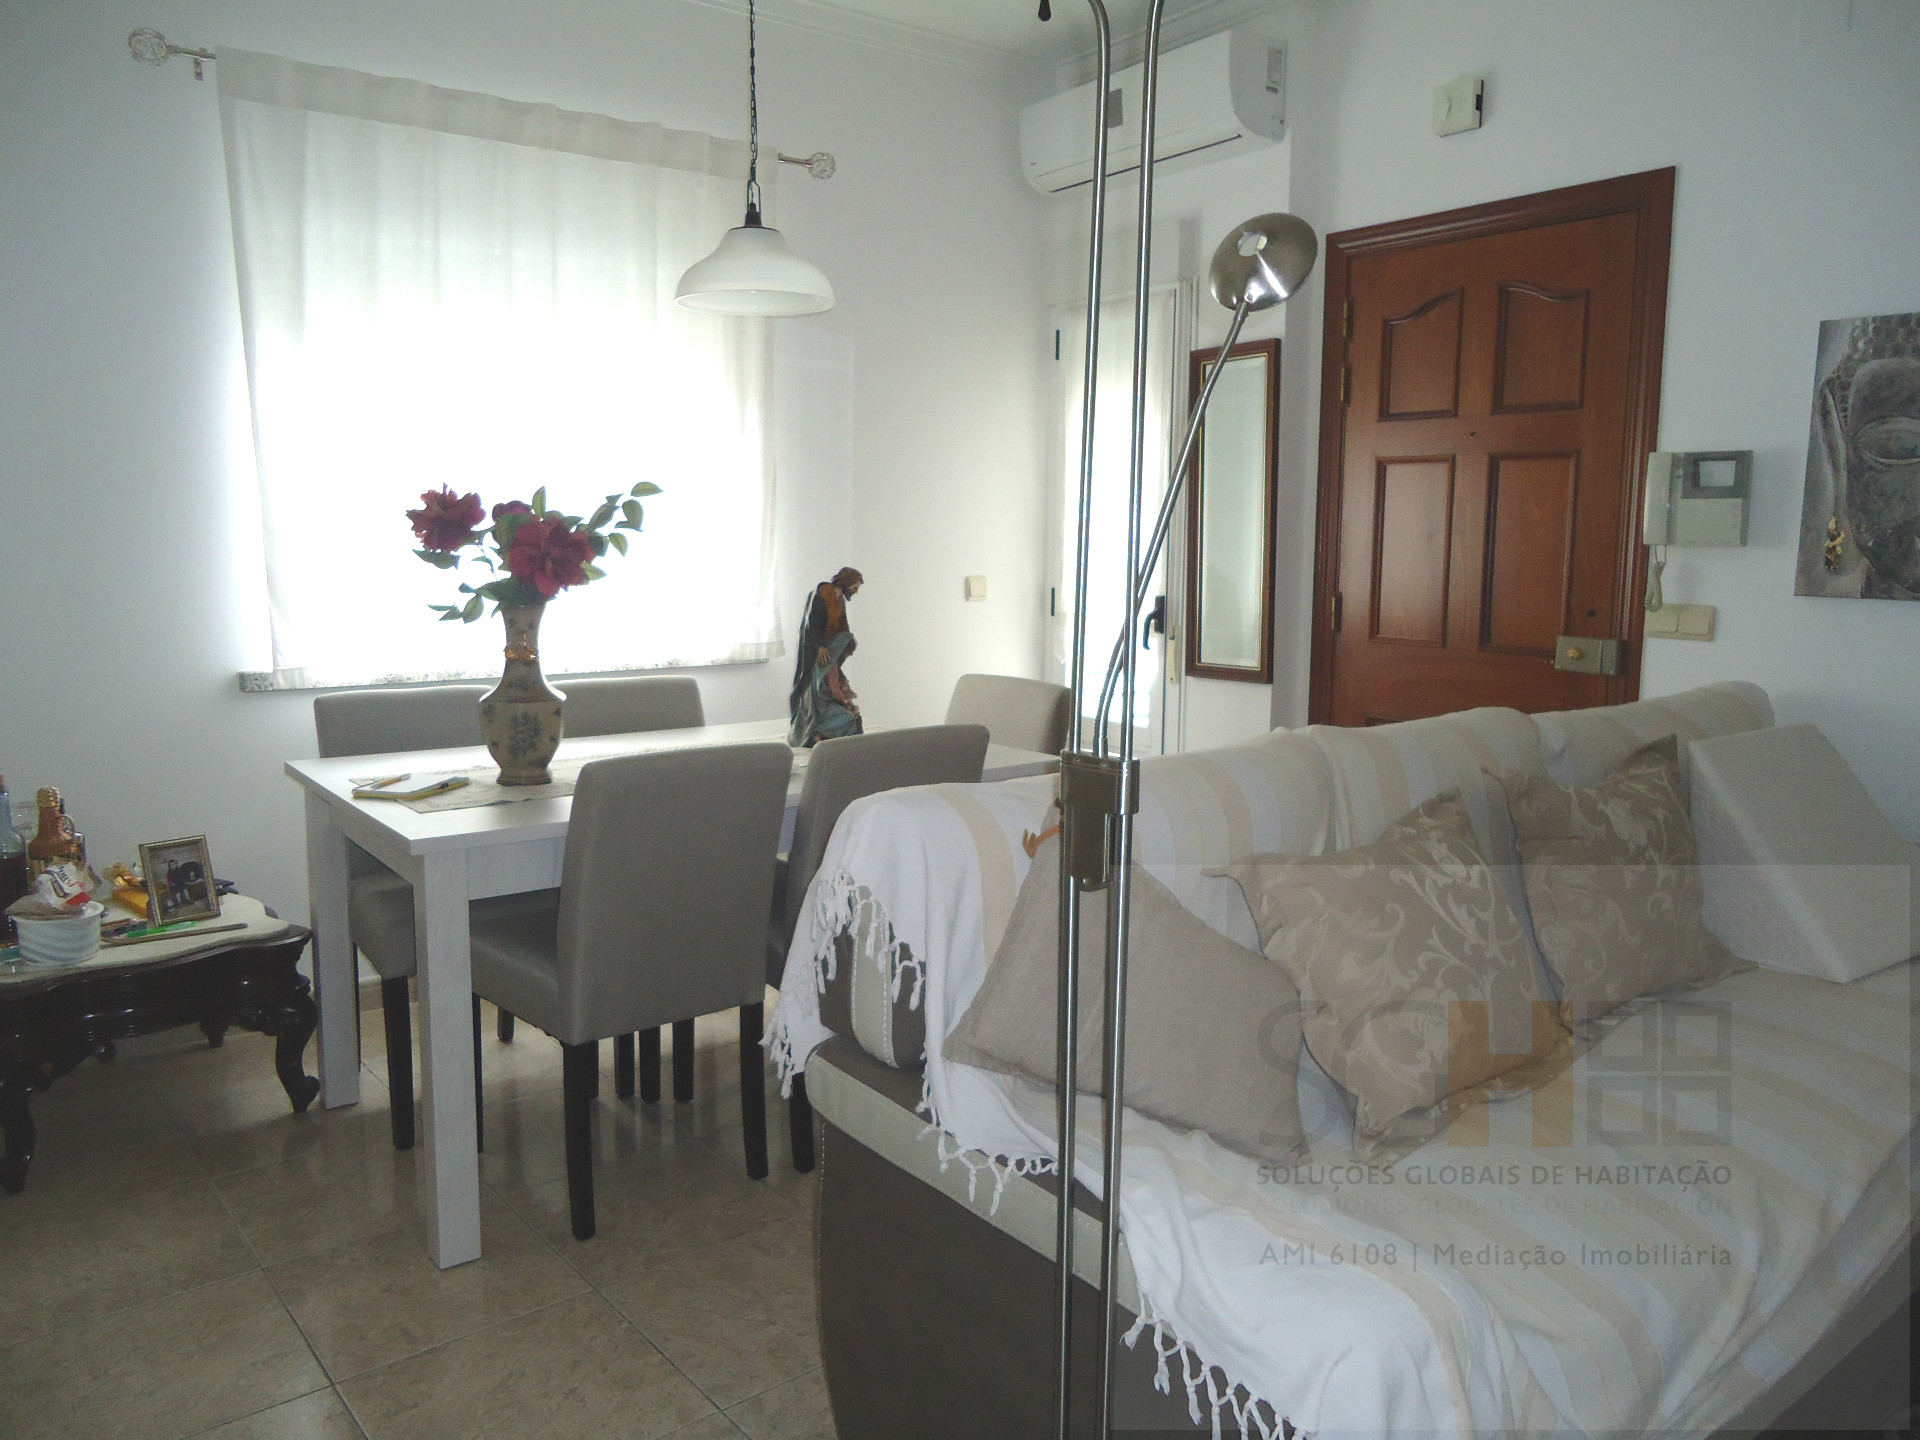 Venda Apartamento T1 Alcains, zona central